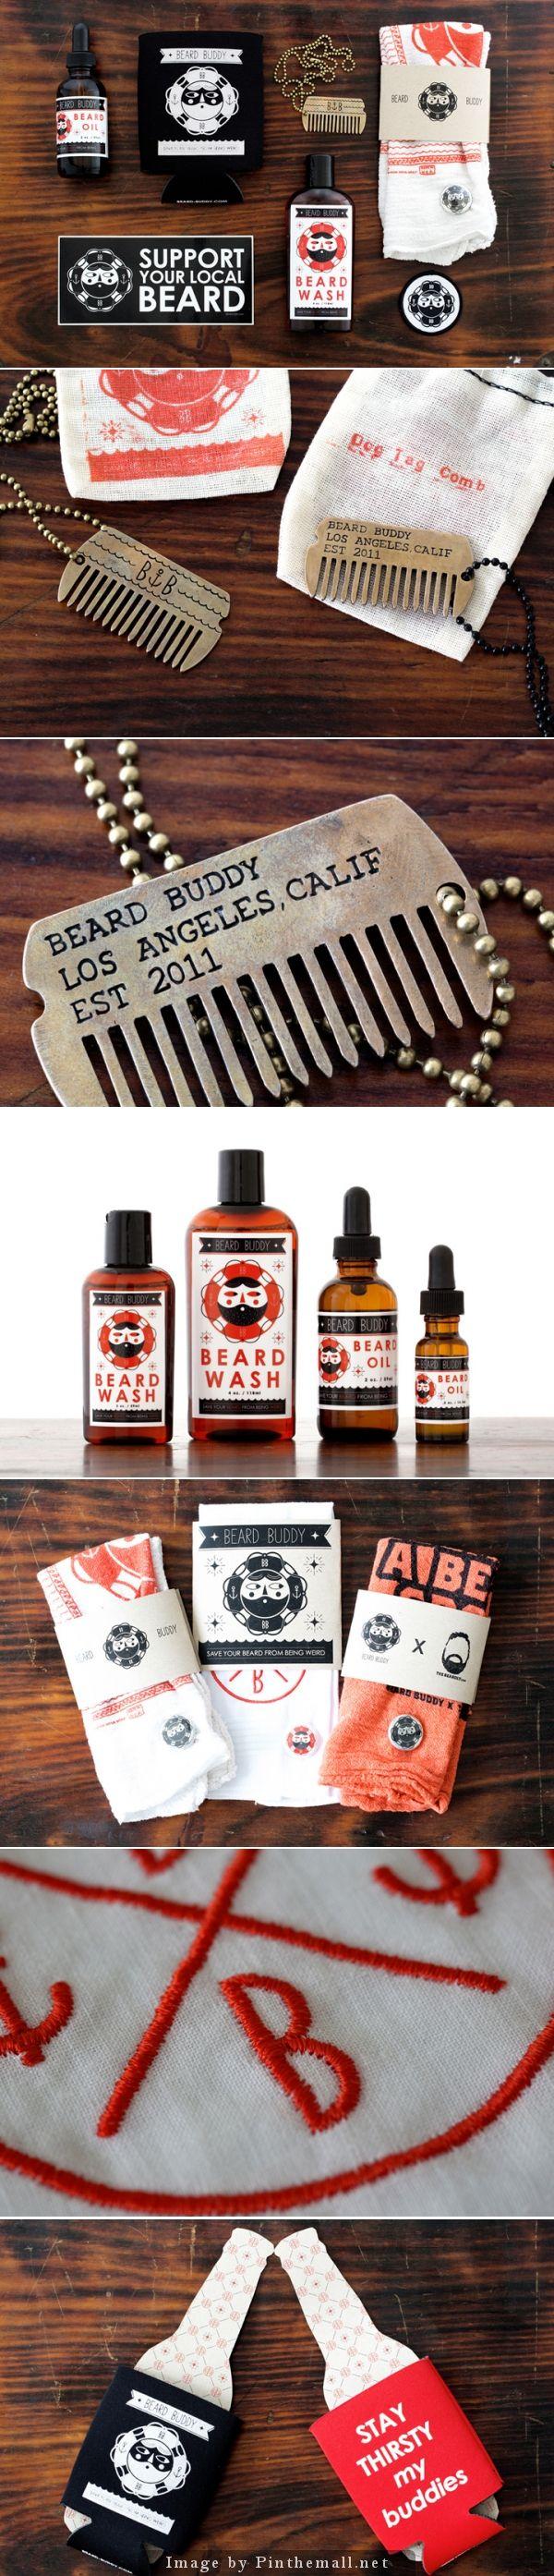 Branding Project: Beard Buddy